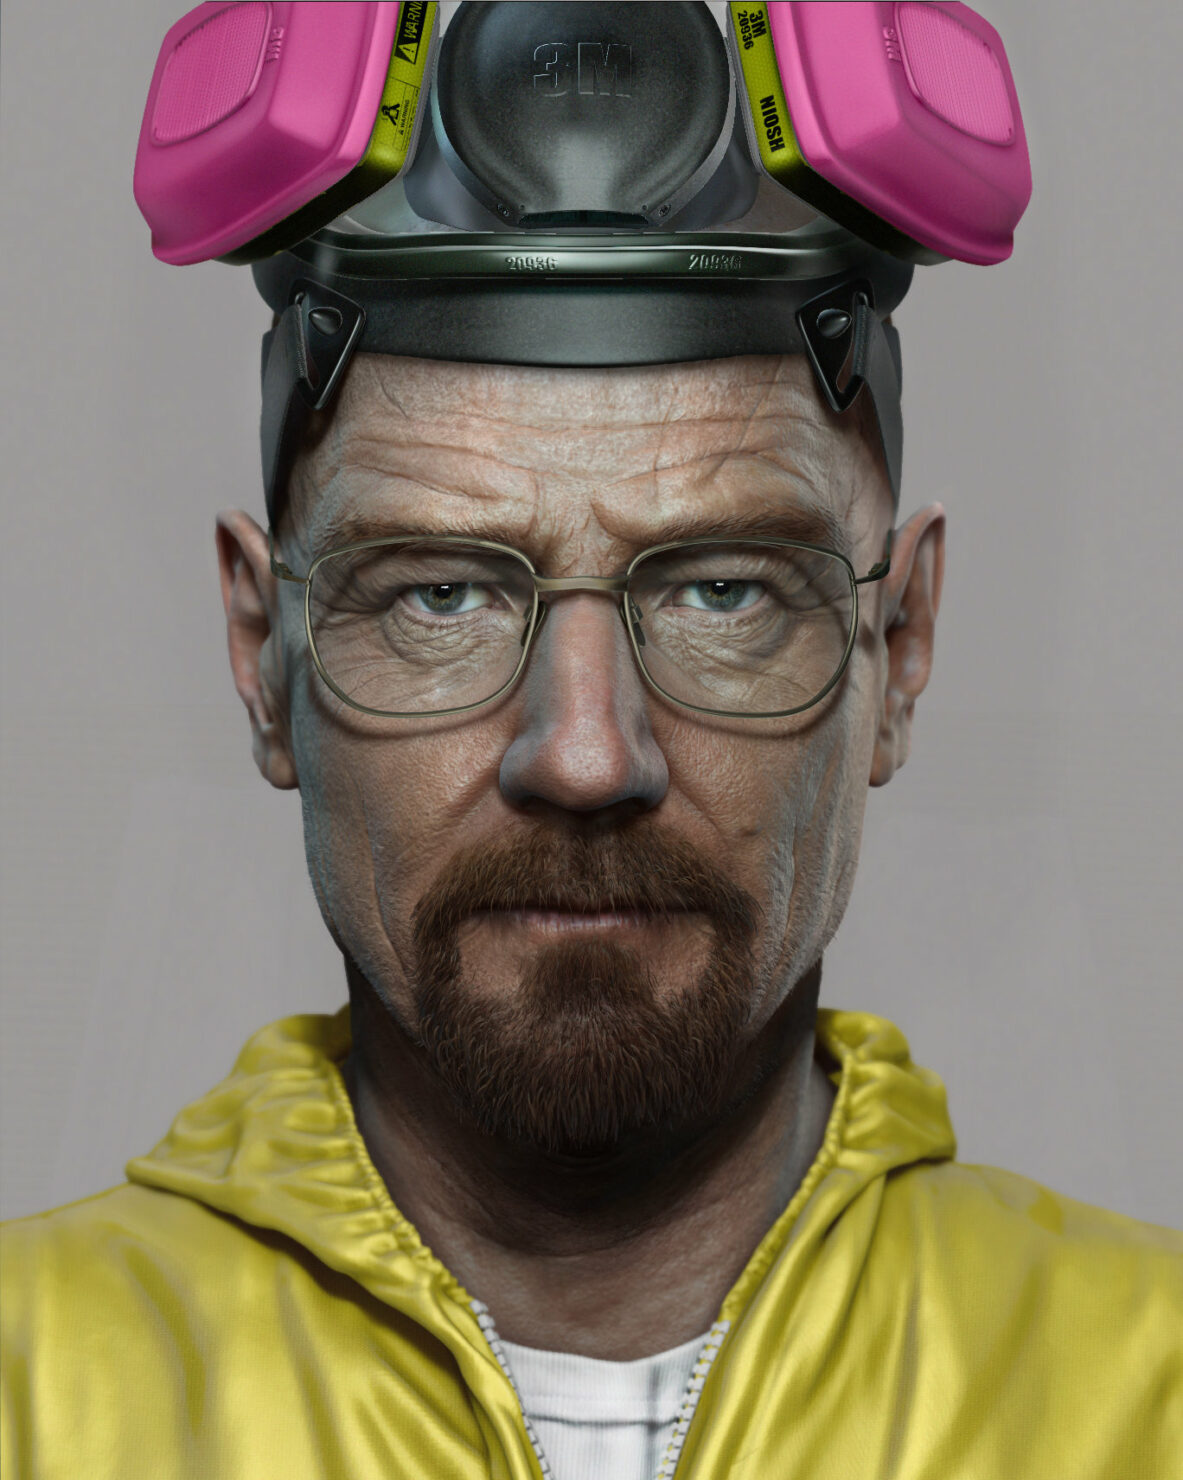 front_front_1_pass_main_add_beard_close_up_new